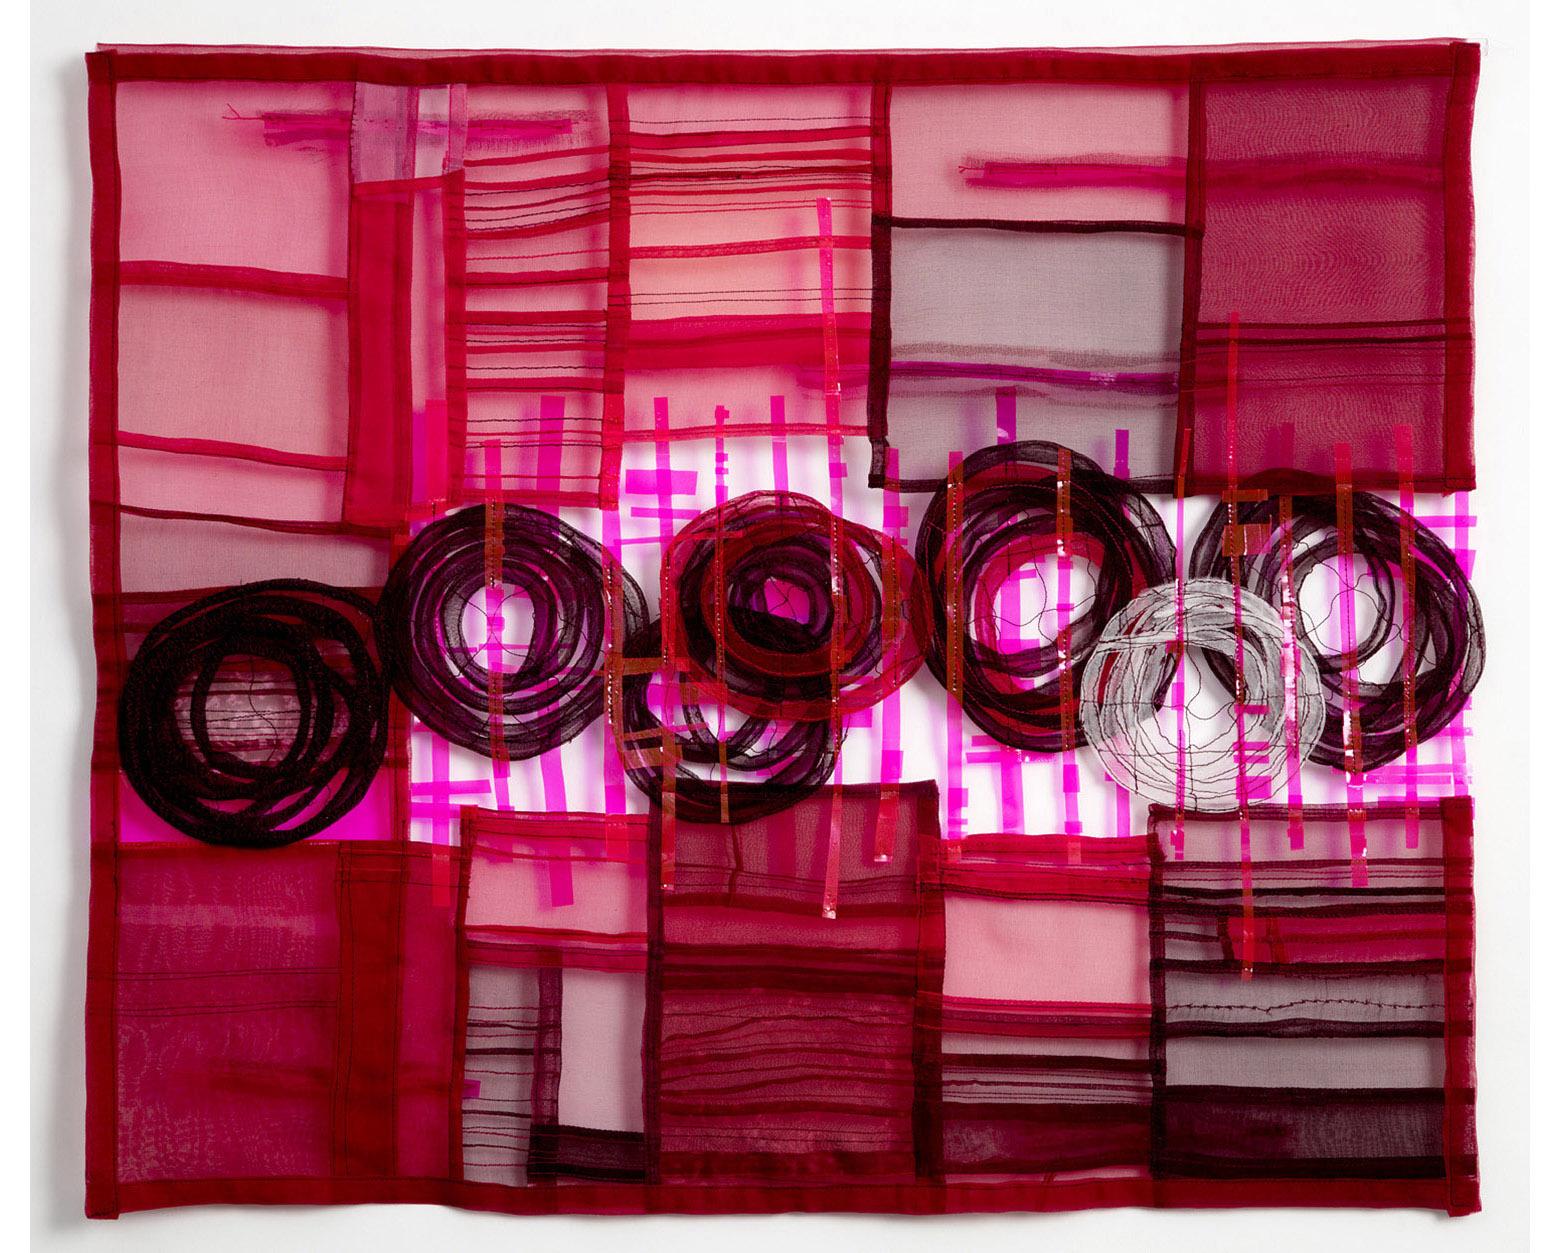 52_1_Joan_Diamond_With Time I Tumble Forward copy.jpg